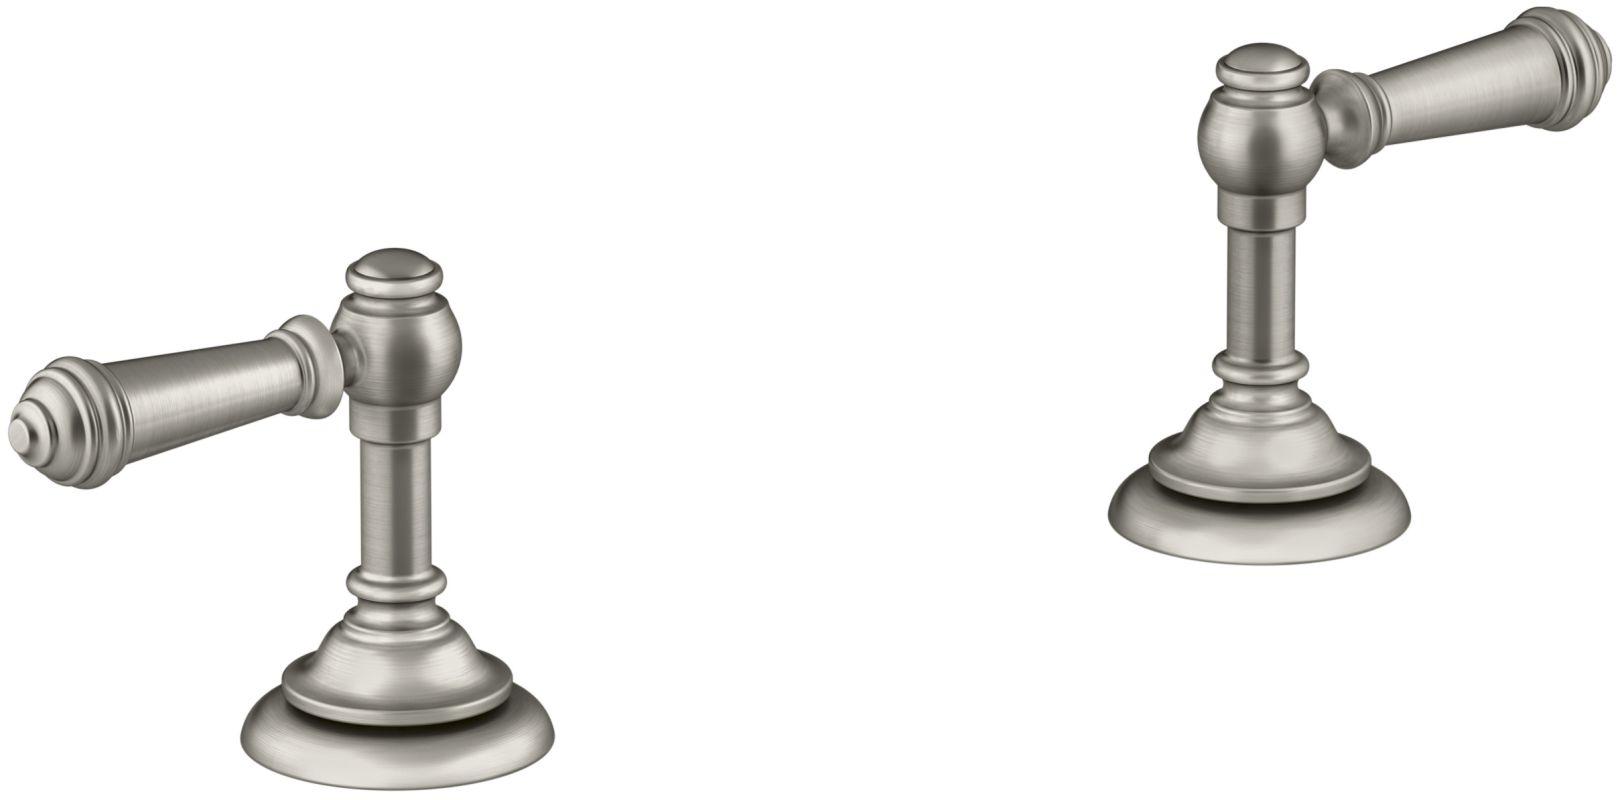 Kohler K T98071 4 BN Vibrant Brushed Nickel Artifacts Lever Handles For Roman